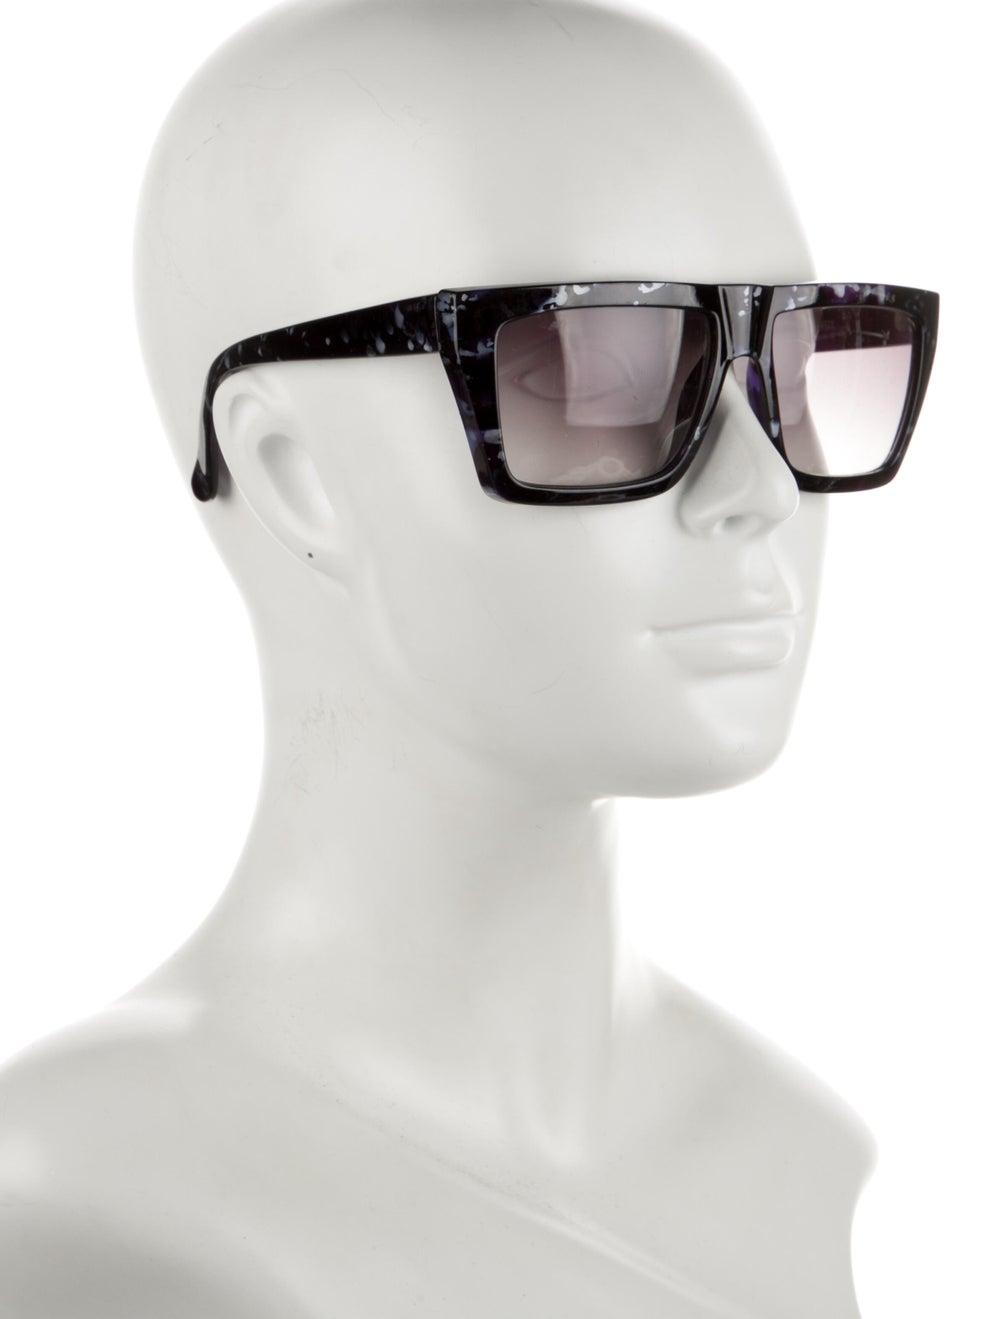 Gianni Versace Square Gradient Sunglasses Blue - image 4